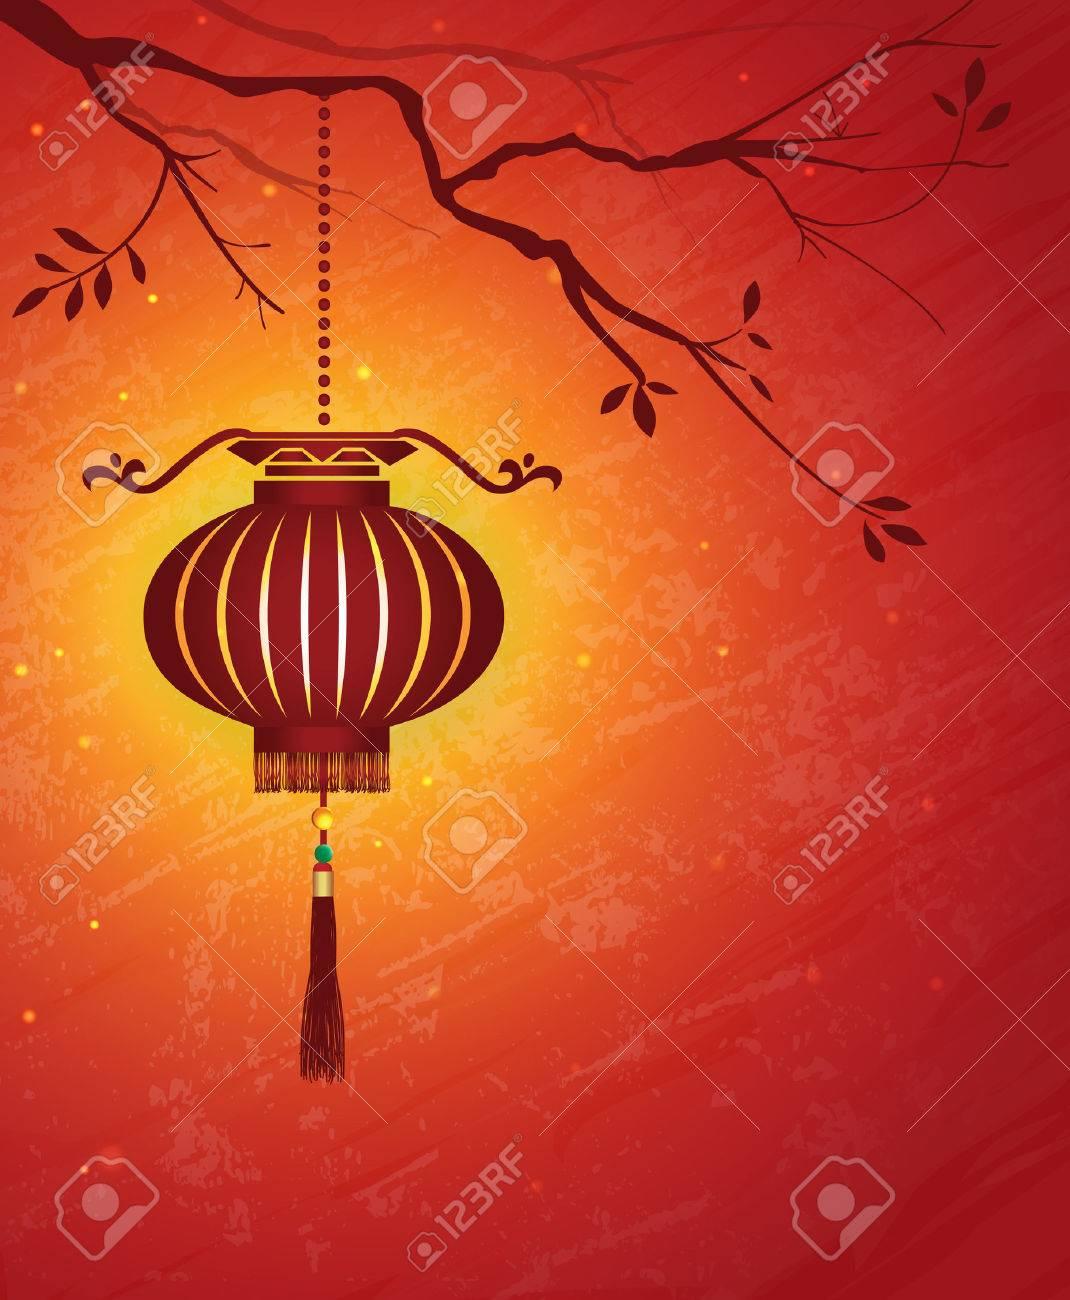 chinese new year lantern background stock vector 23476888 - Chinese New Year Lantern